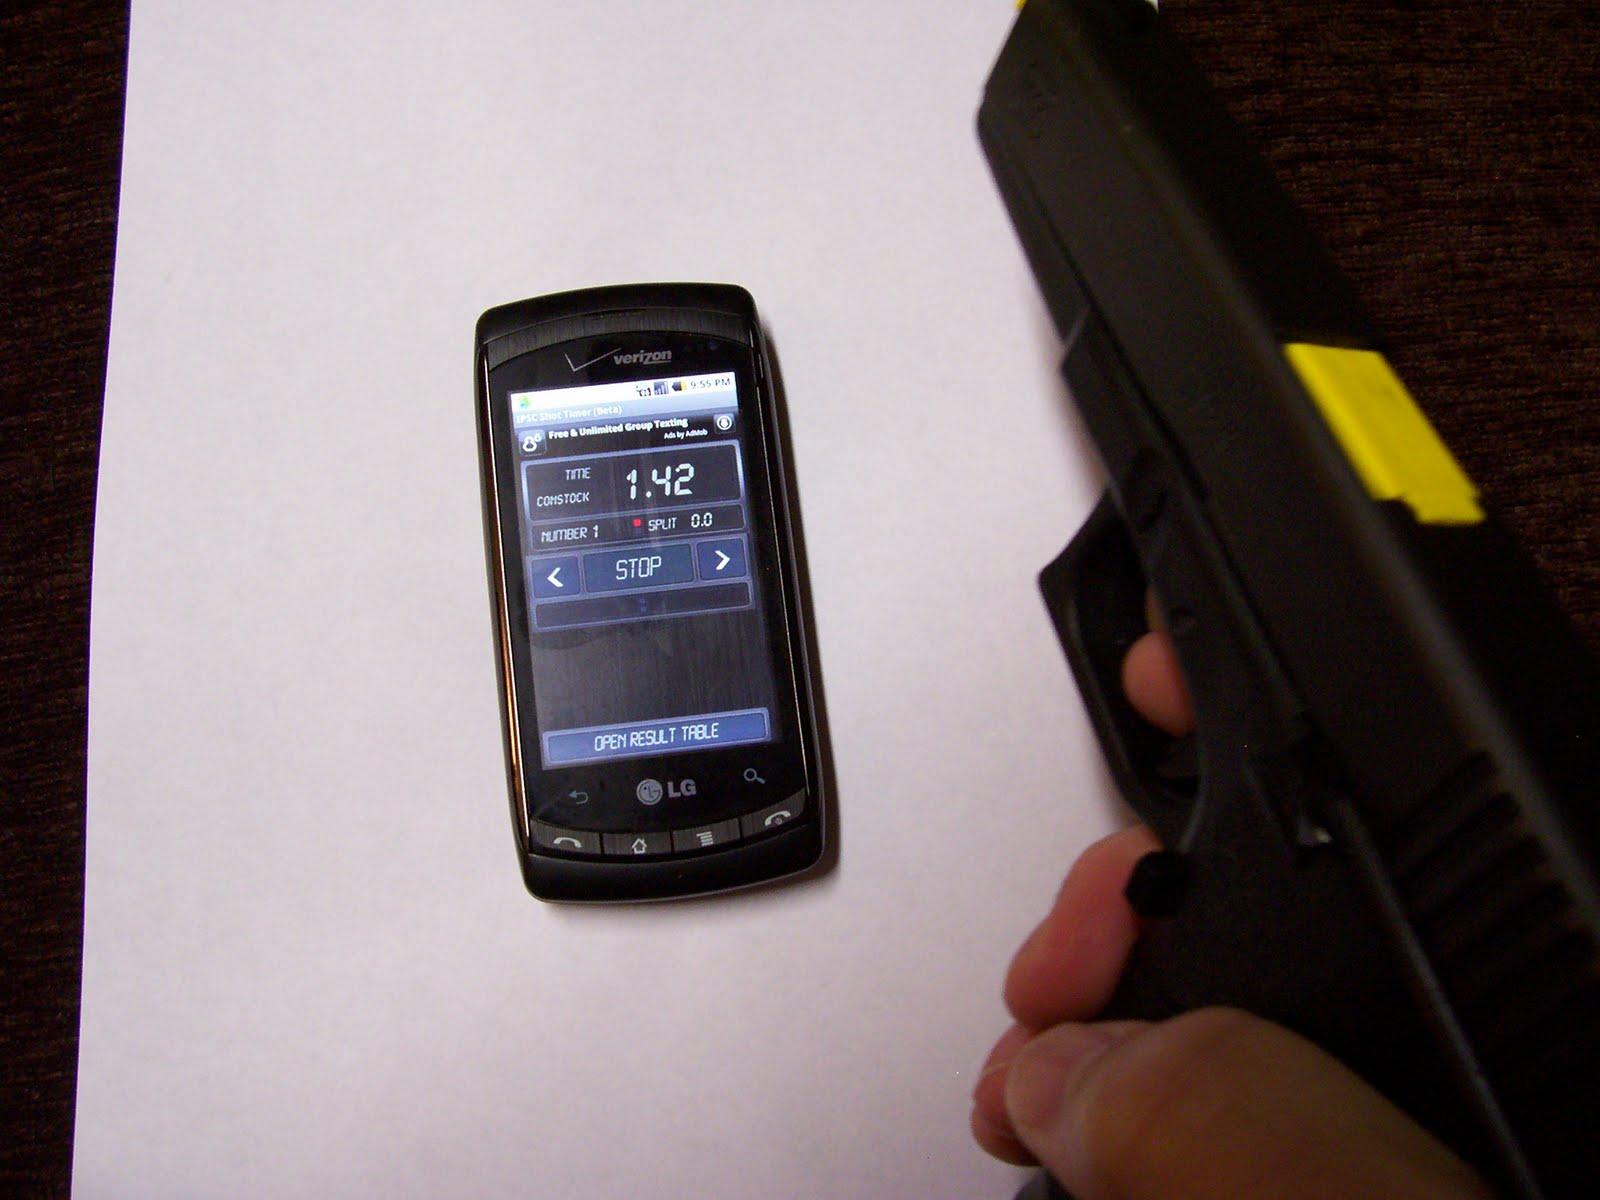 ipsc shot timer app instructions